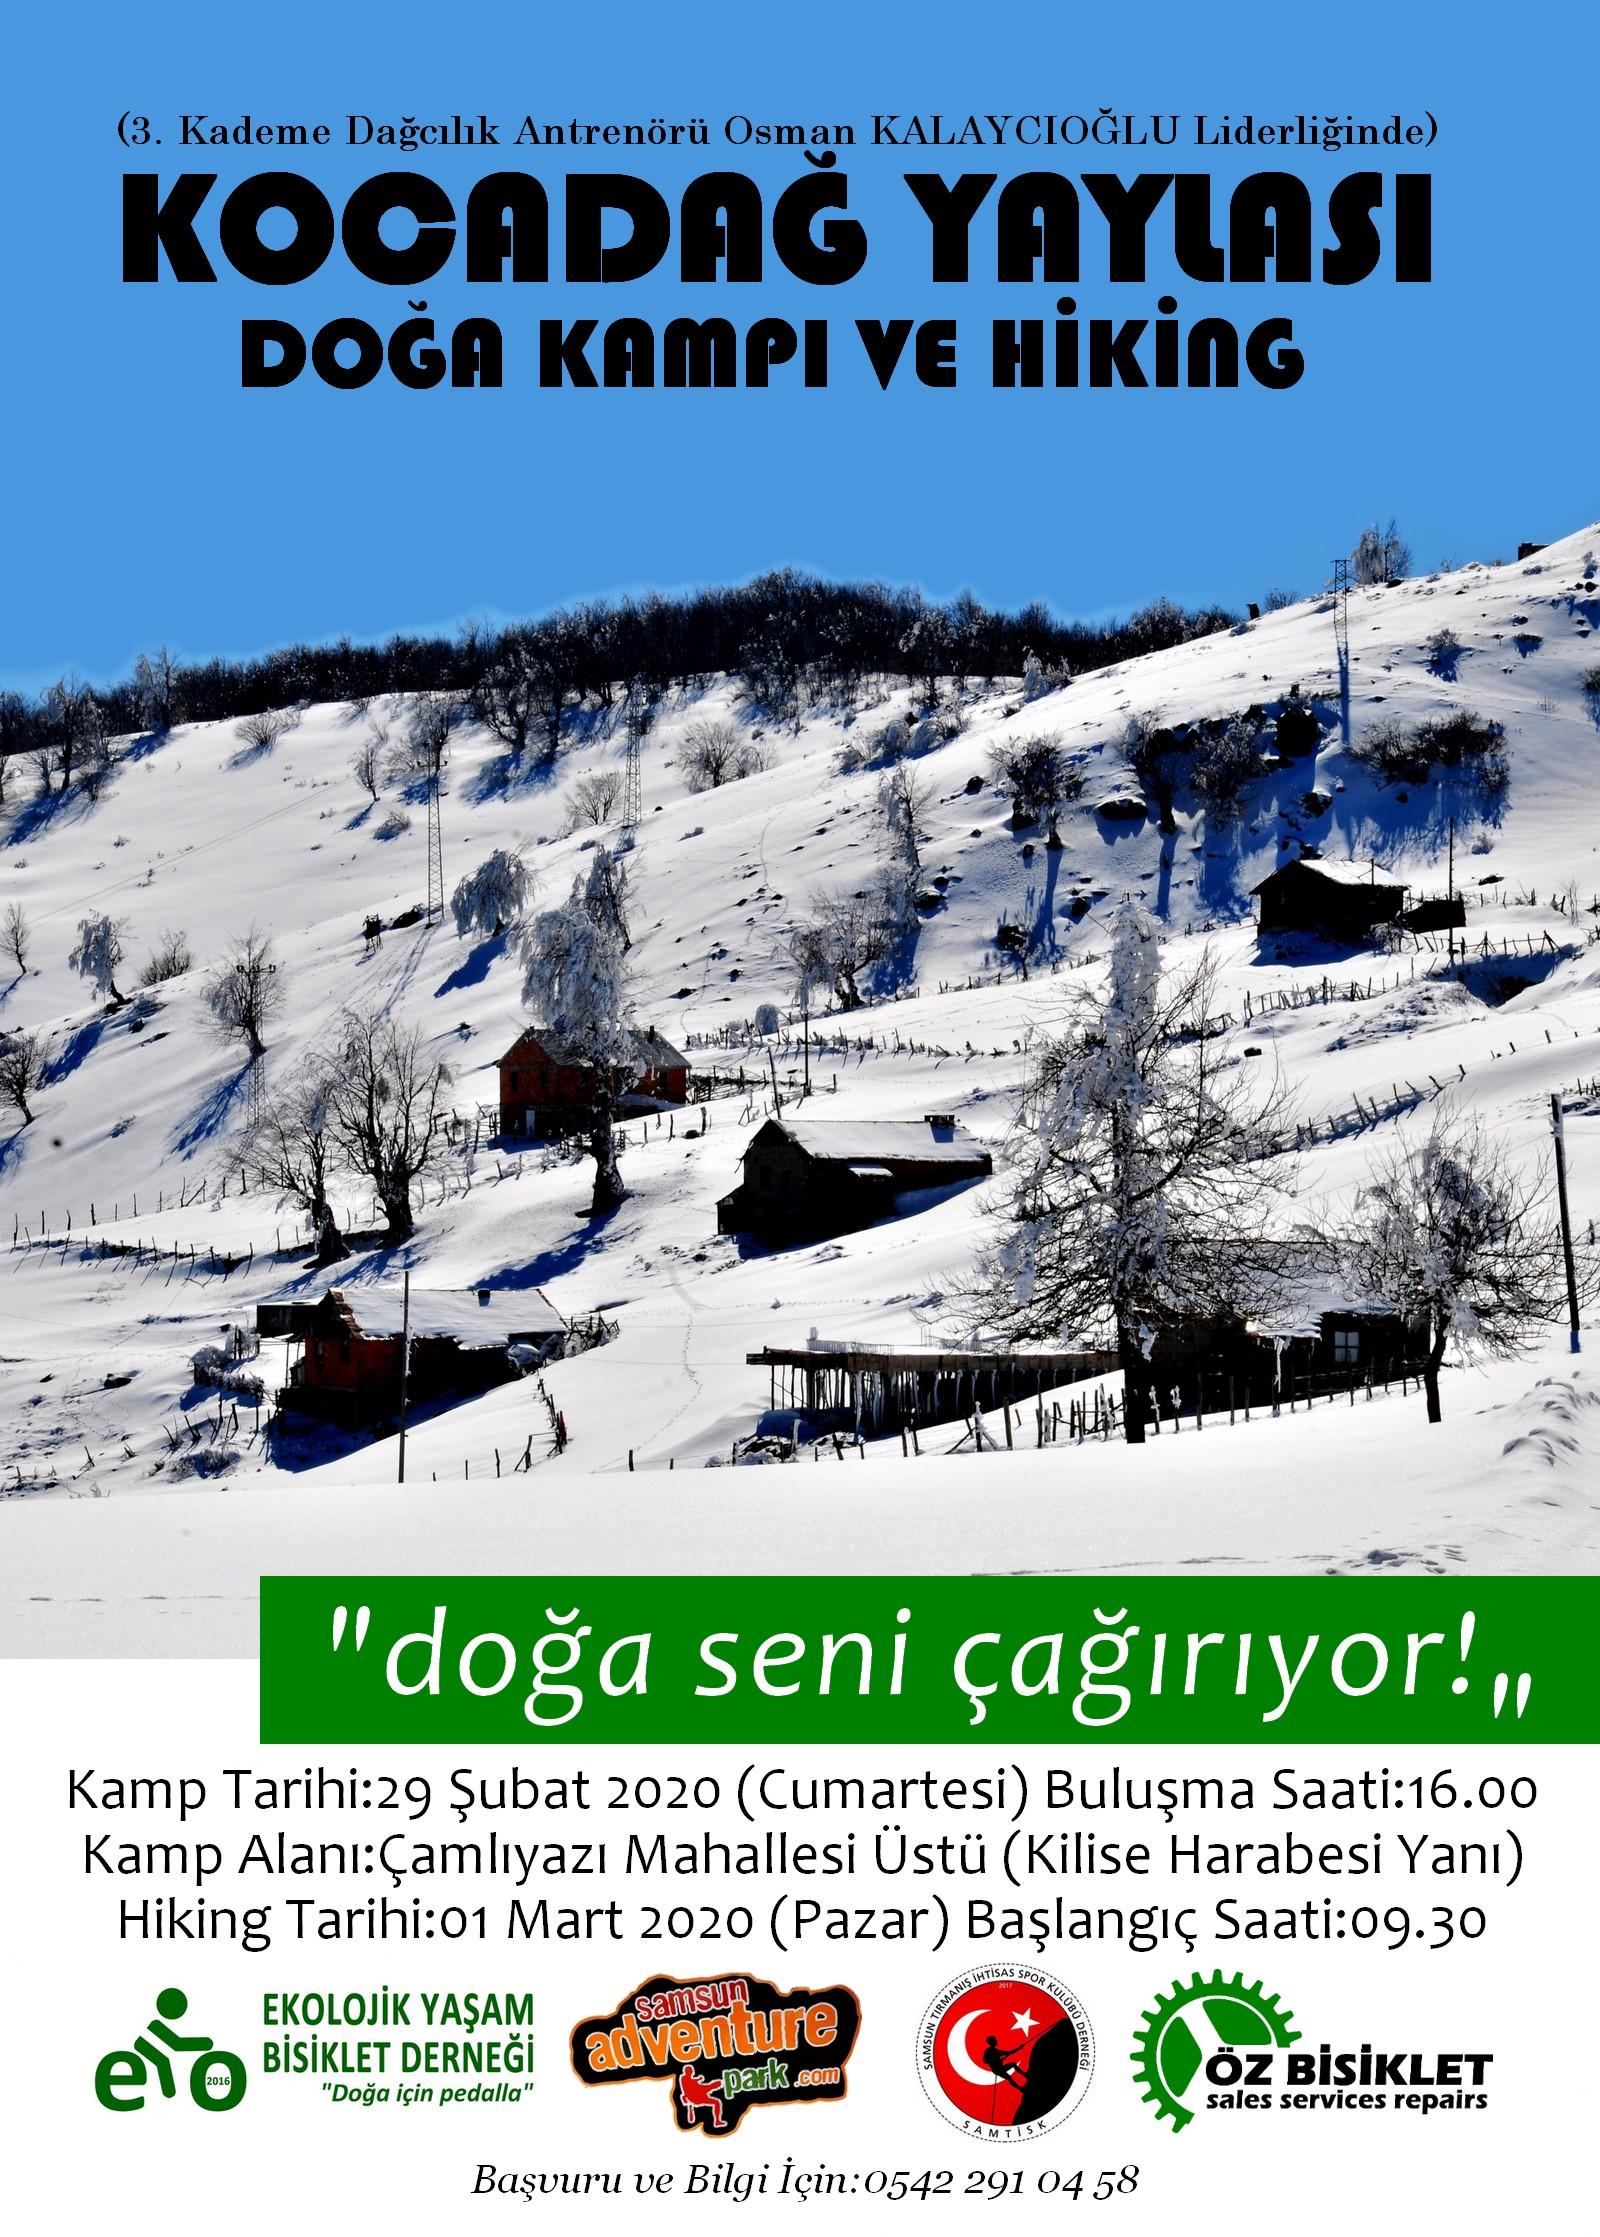 KOCADAĞ KAMPI VE HİKİNG